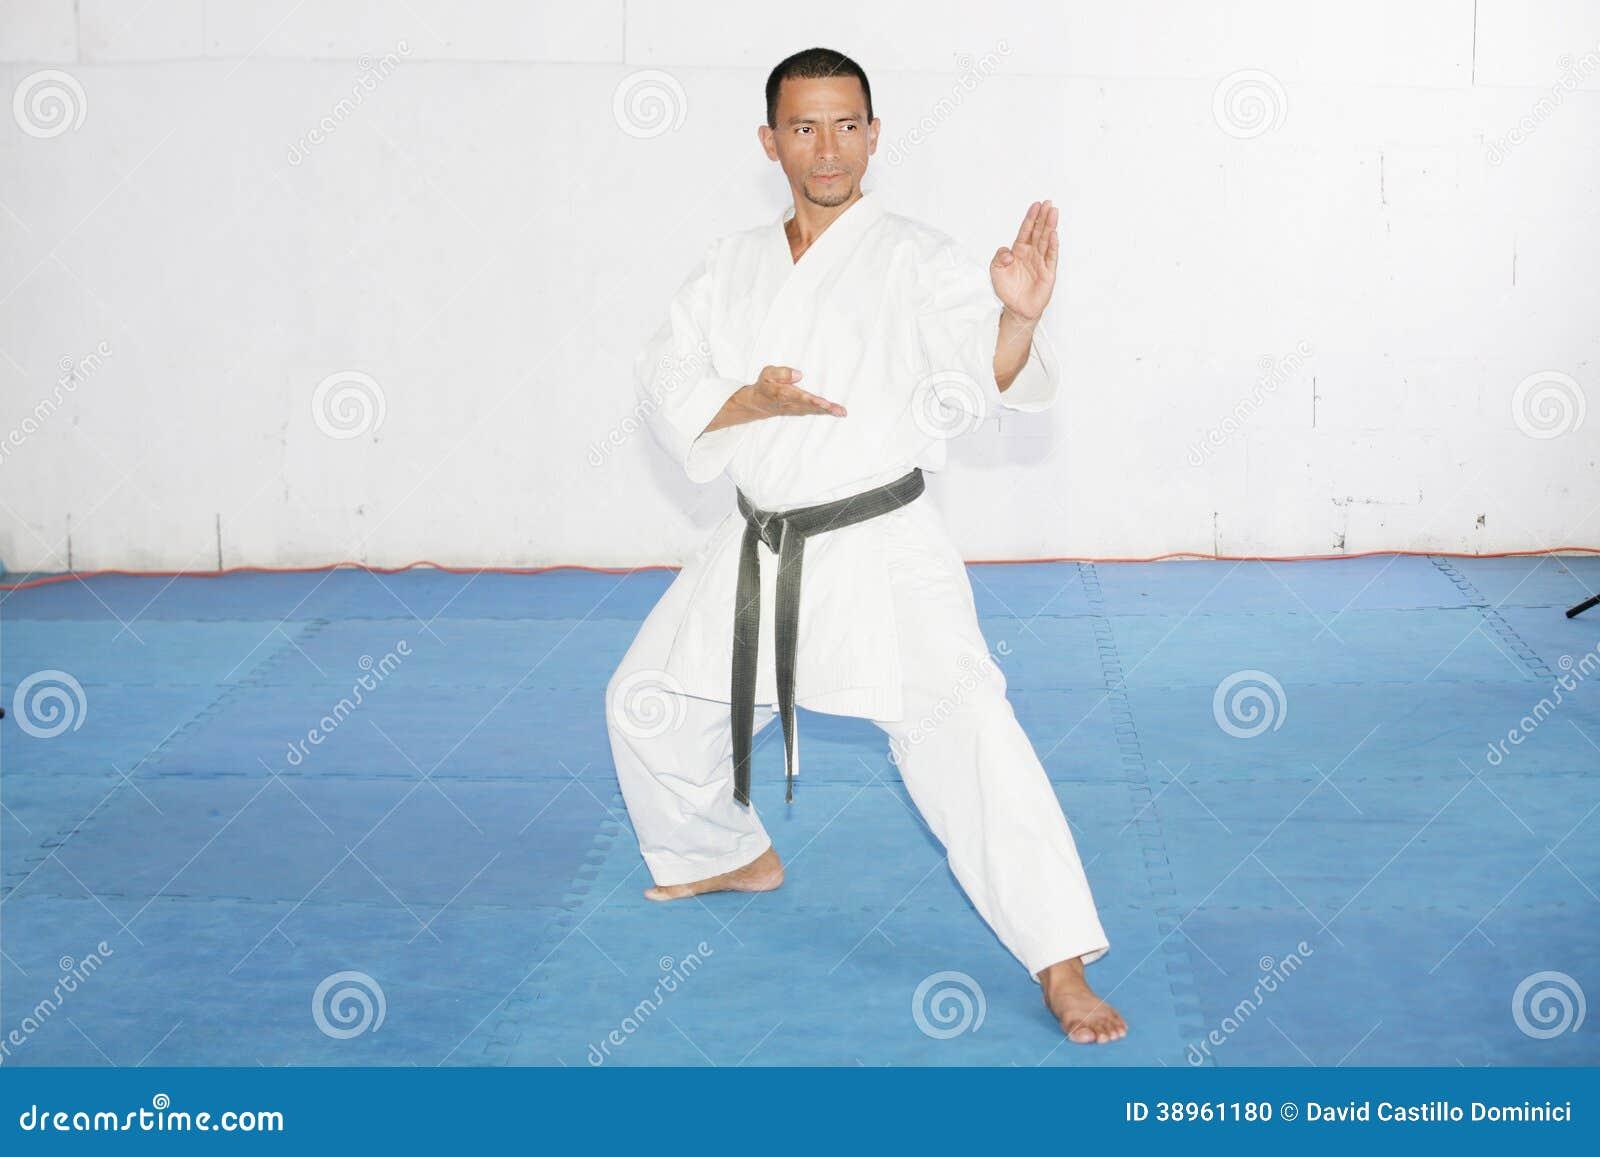 from Harlan black men in karate